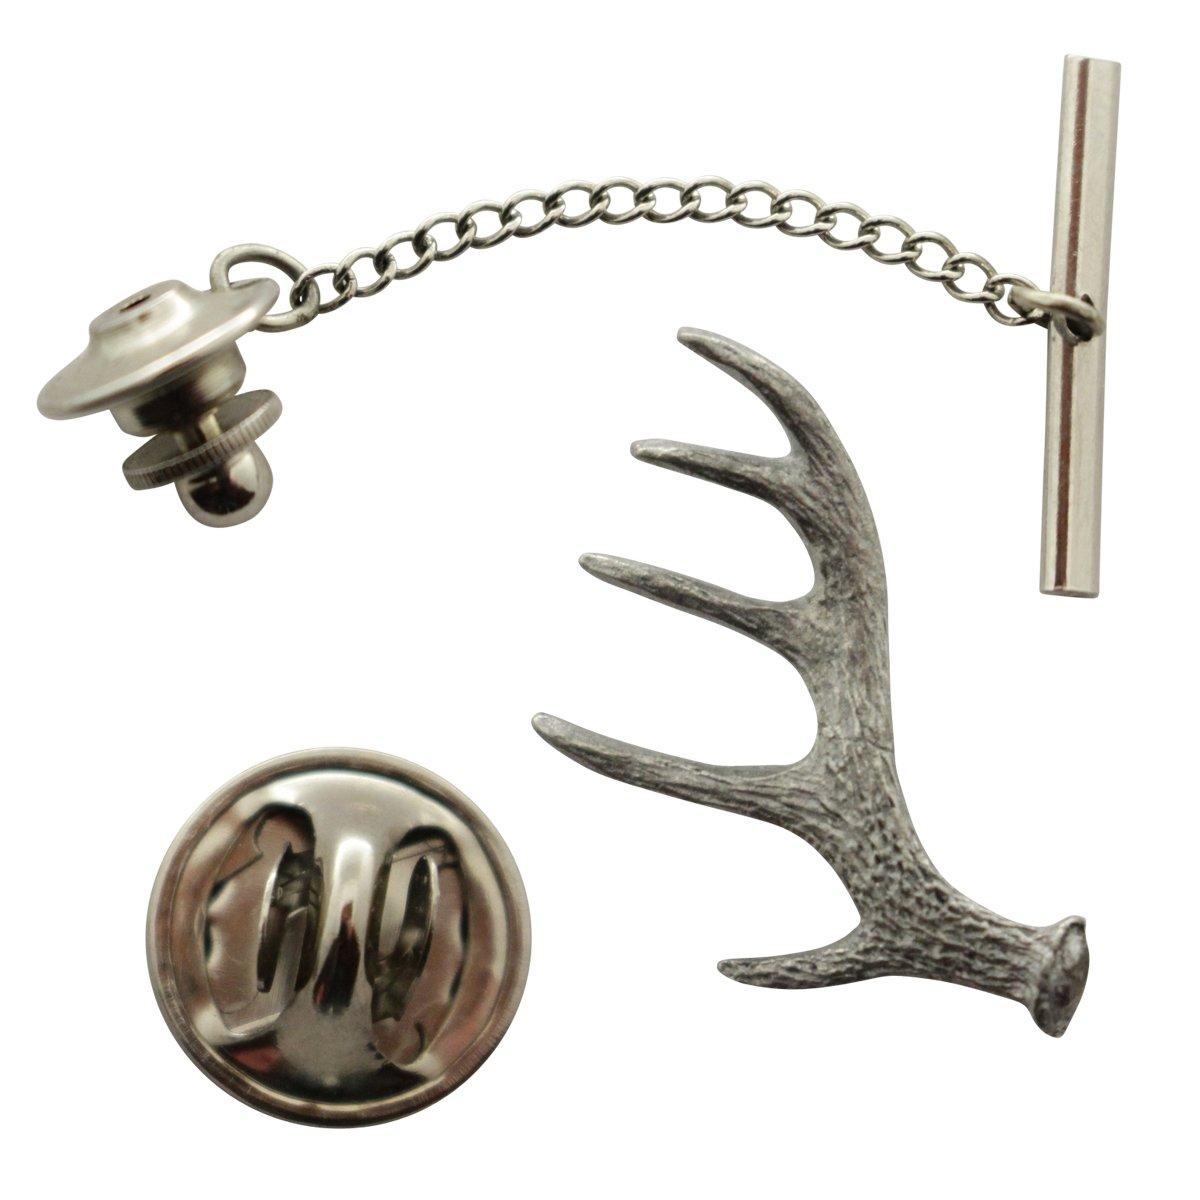 Antler Shed Tie Tack ~ Antiqued Pewter ~ Tie Tack or Pin ~ Sarah's Treats & Treasures